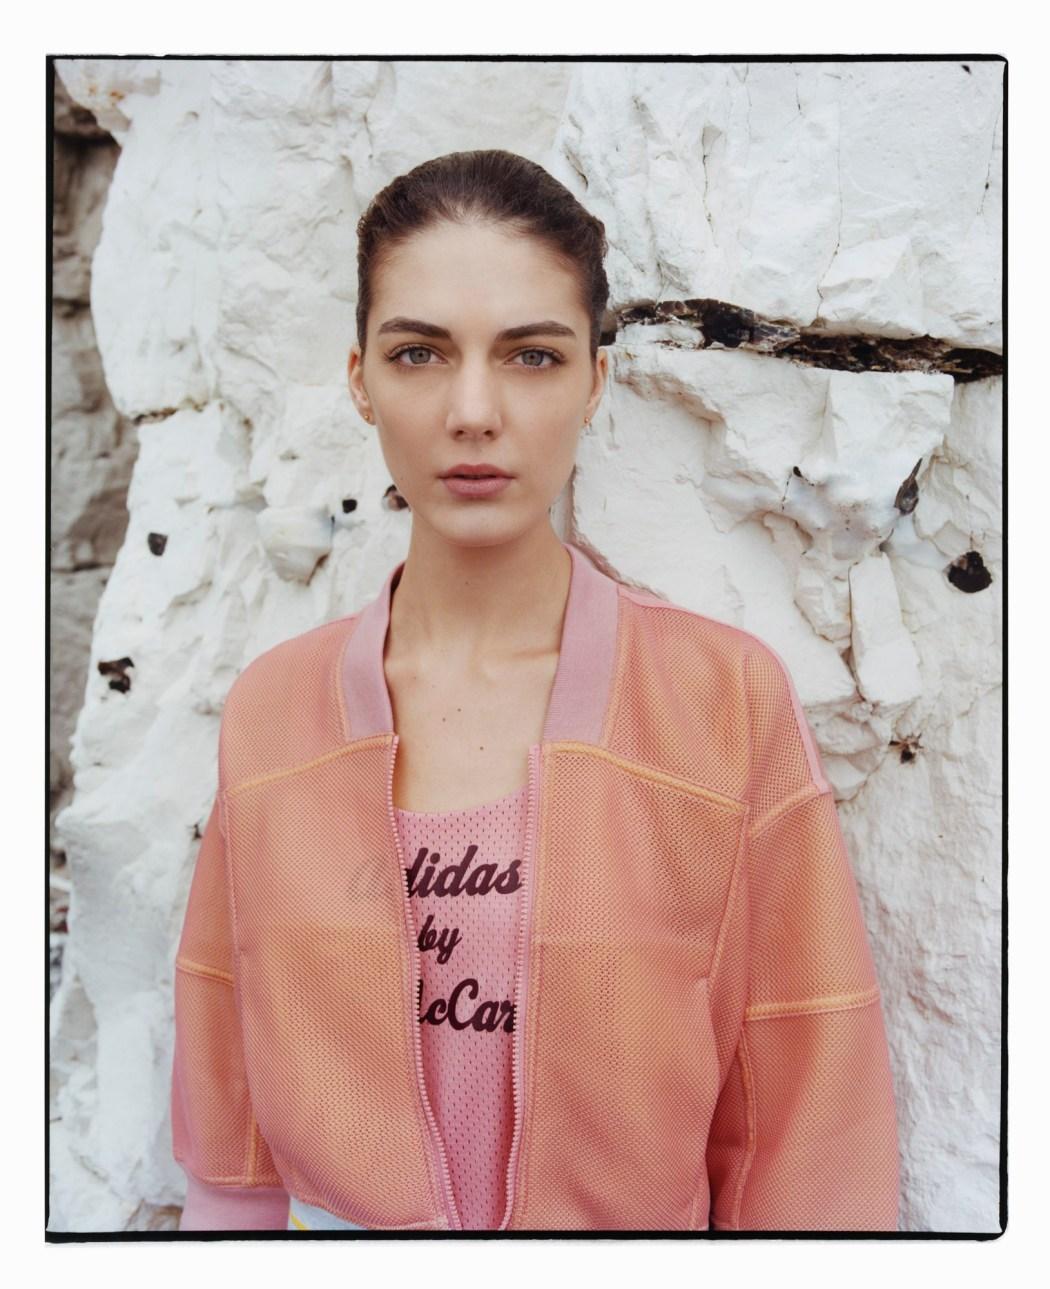 adidas by Stella McCartney全新2014春夏系列 未來感圖紋襯托復古剪裁 營造摩登女性運動迷人姿態